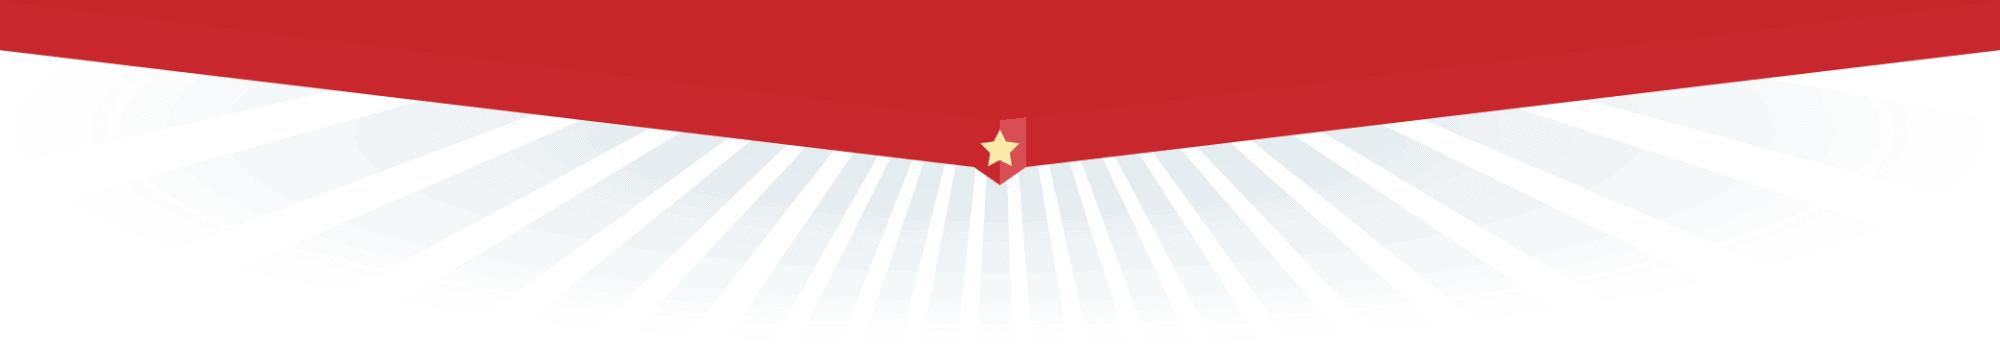 header-red-bar-rays-white-background-2000px